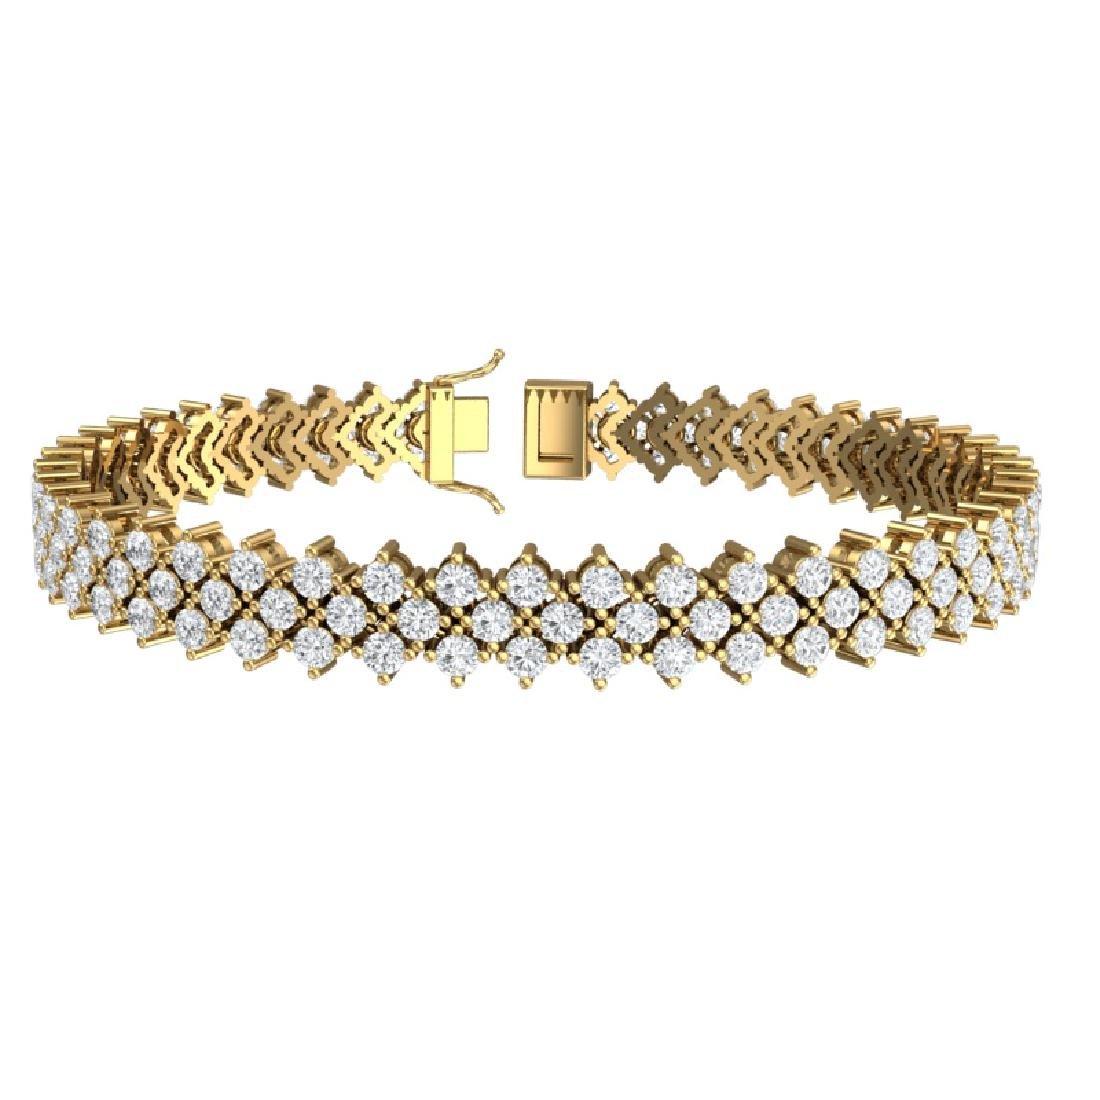 10 CTW Certified SI/I Diamond Bracelet 18K Yellow Gold - 3